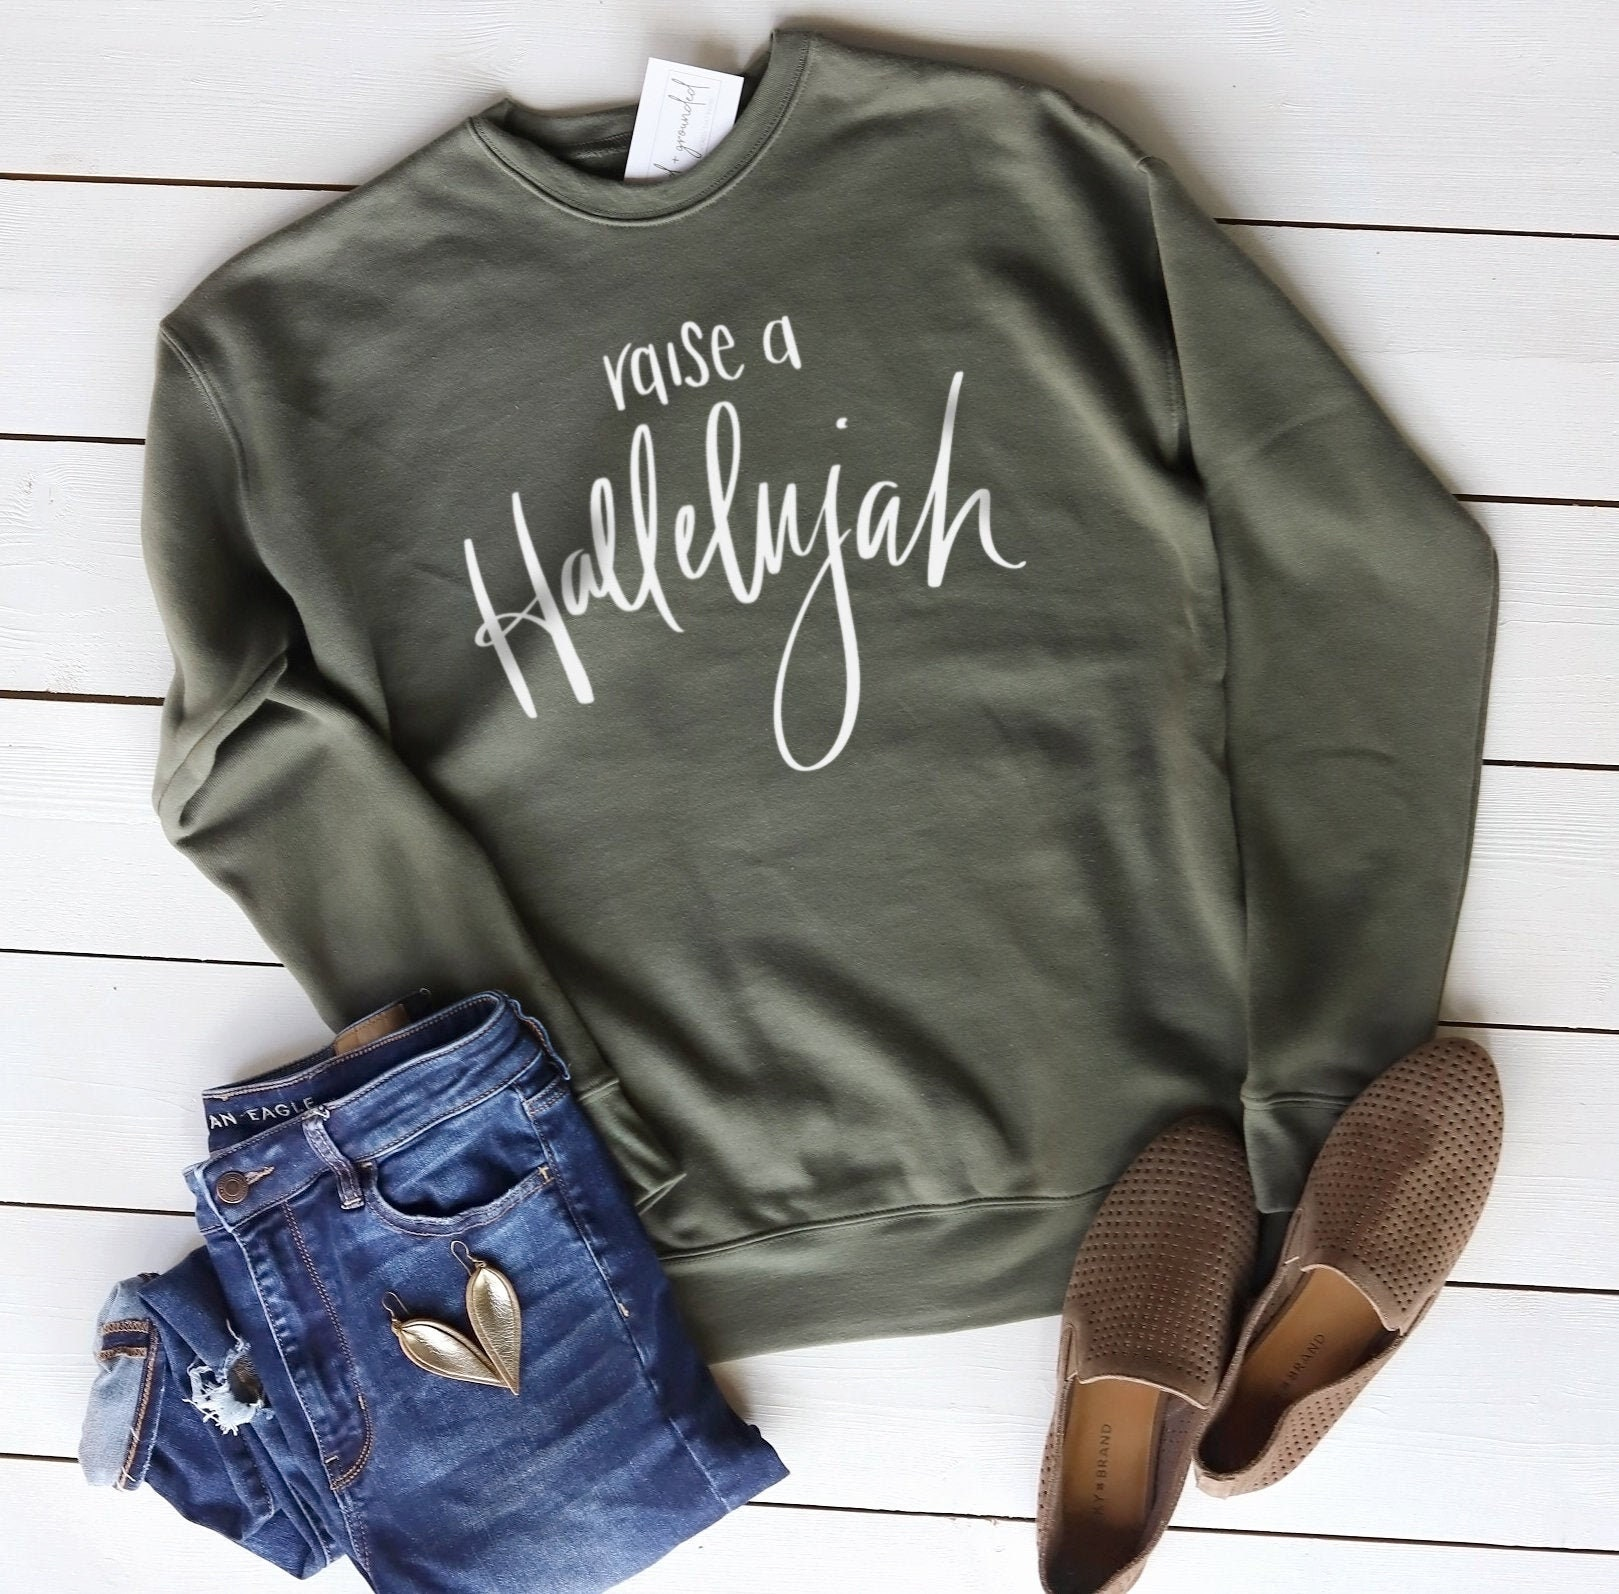 Raise A Hallelujah Sweatshirt Christian Clothing Womens Christian Sweatshirt Womens Christian Shirts Hallelujah Shirt Hoodie Tshirt